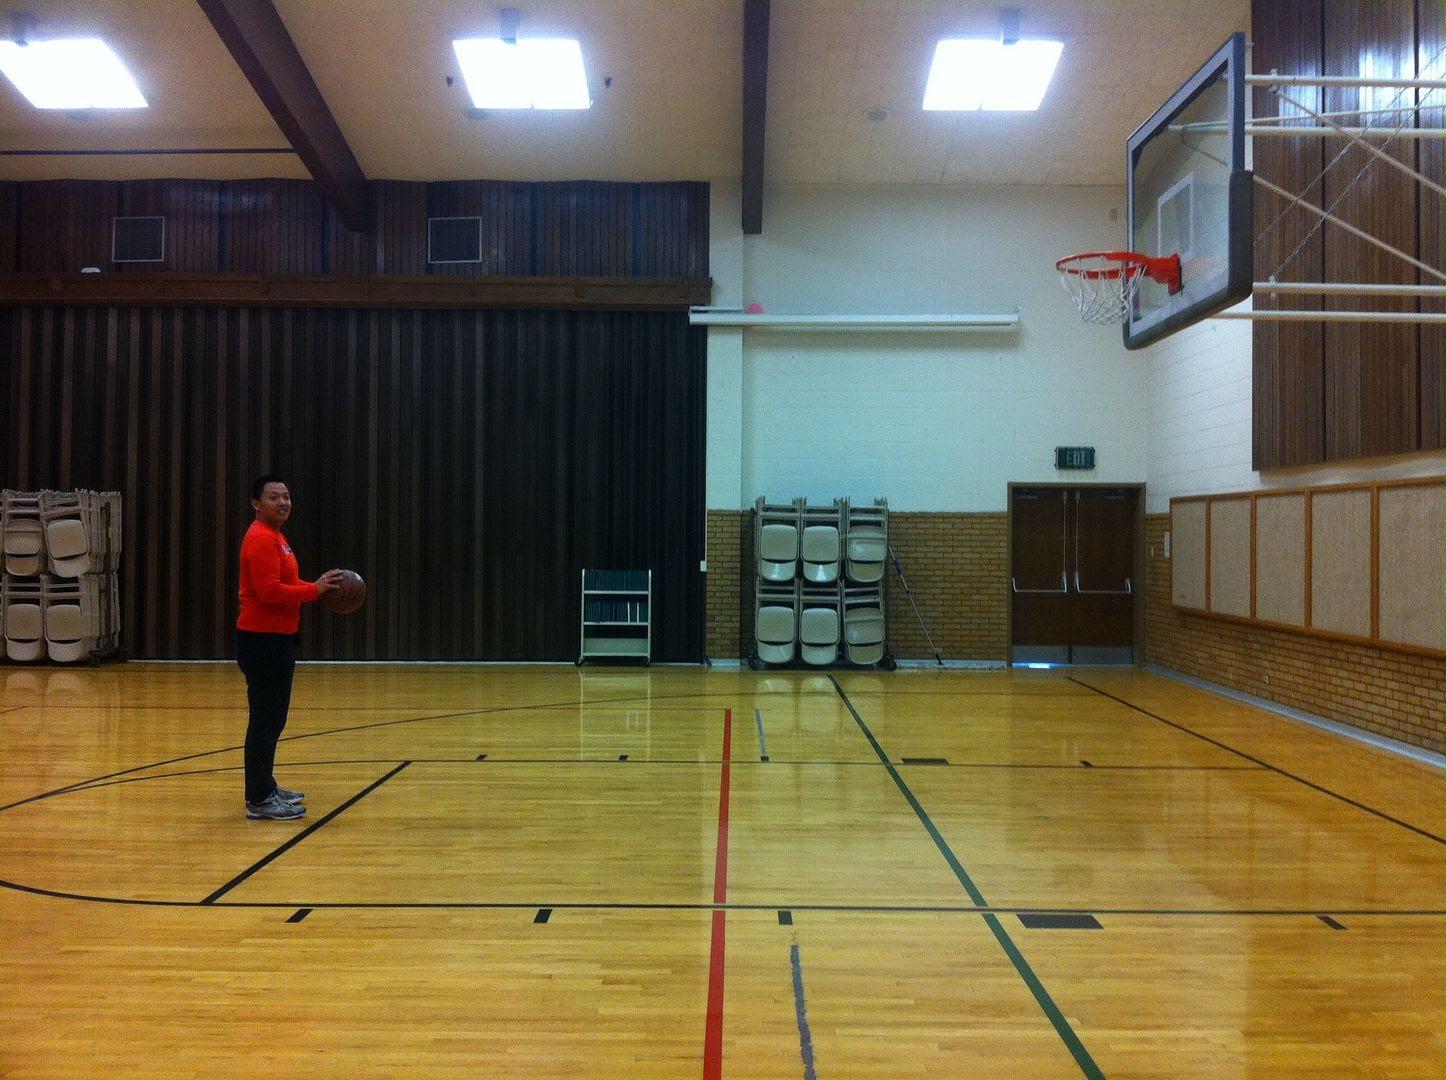 Basketball at the church photo 2014-12-23102804_zps9120b850.jpg